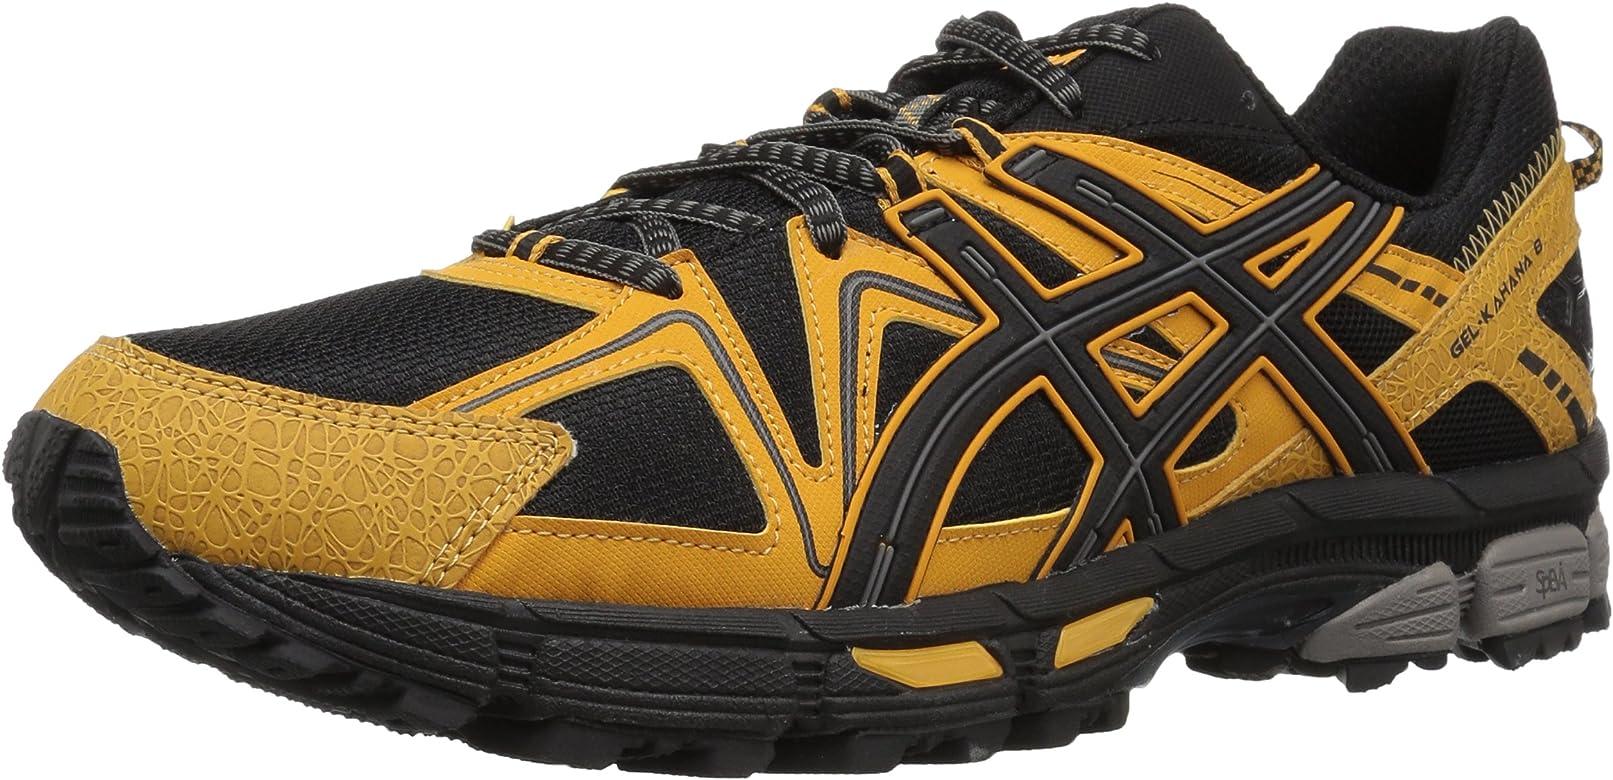 ASICS Mens Gel-Kahana 8 Running Shoe, Directoire Blue/Vibrant Yellow/Black, 8 Medium US: Asics: Amazon.es: Zapatos y complementos